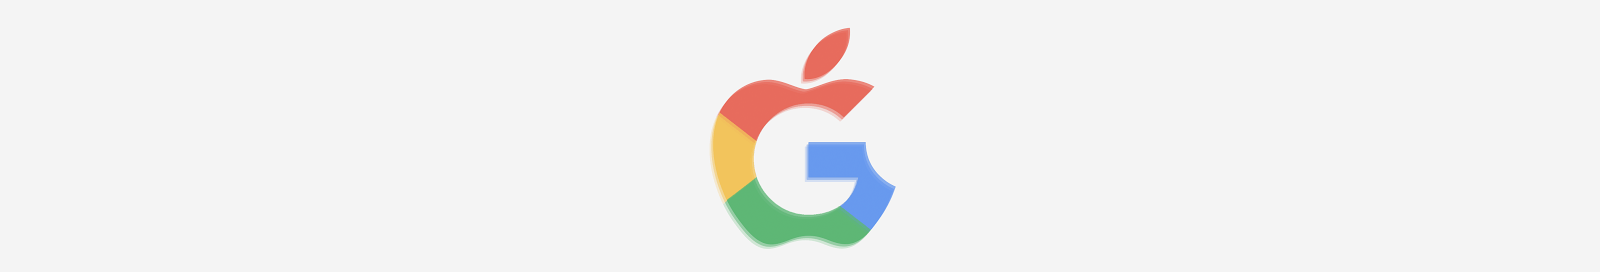 Google Apple Logo